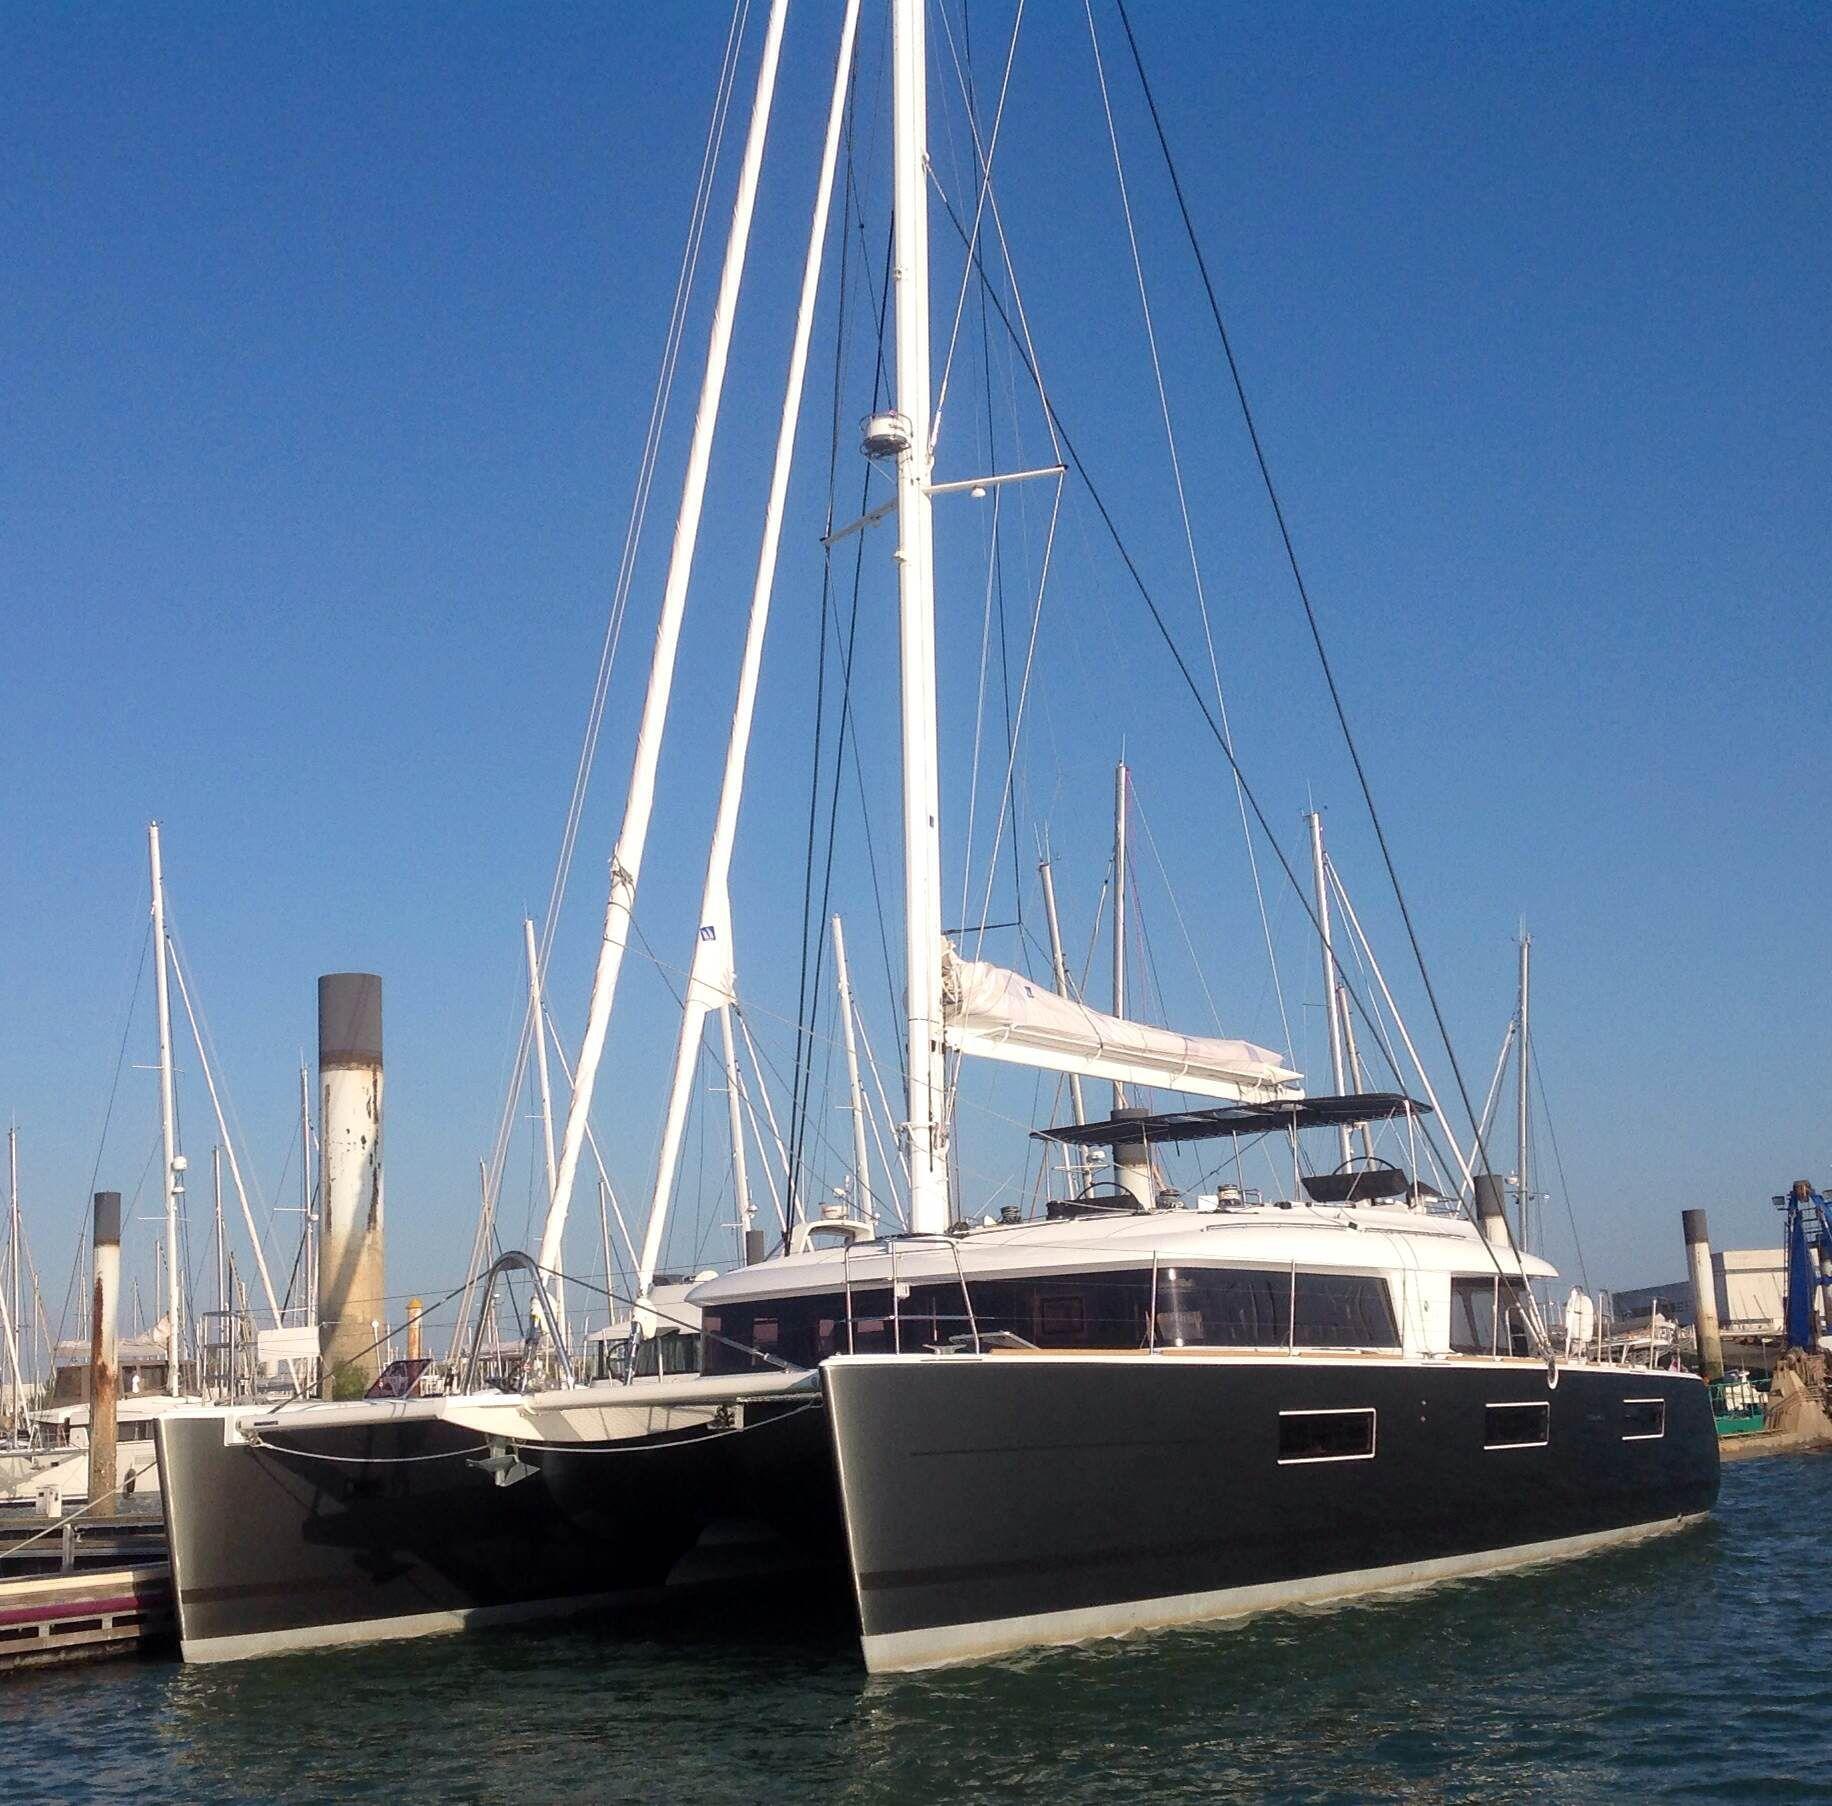 KASKAZI FOUR Lagoon 620 Luxury Catamaran Moored